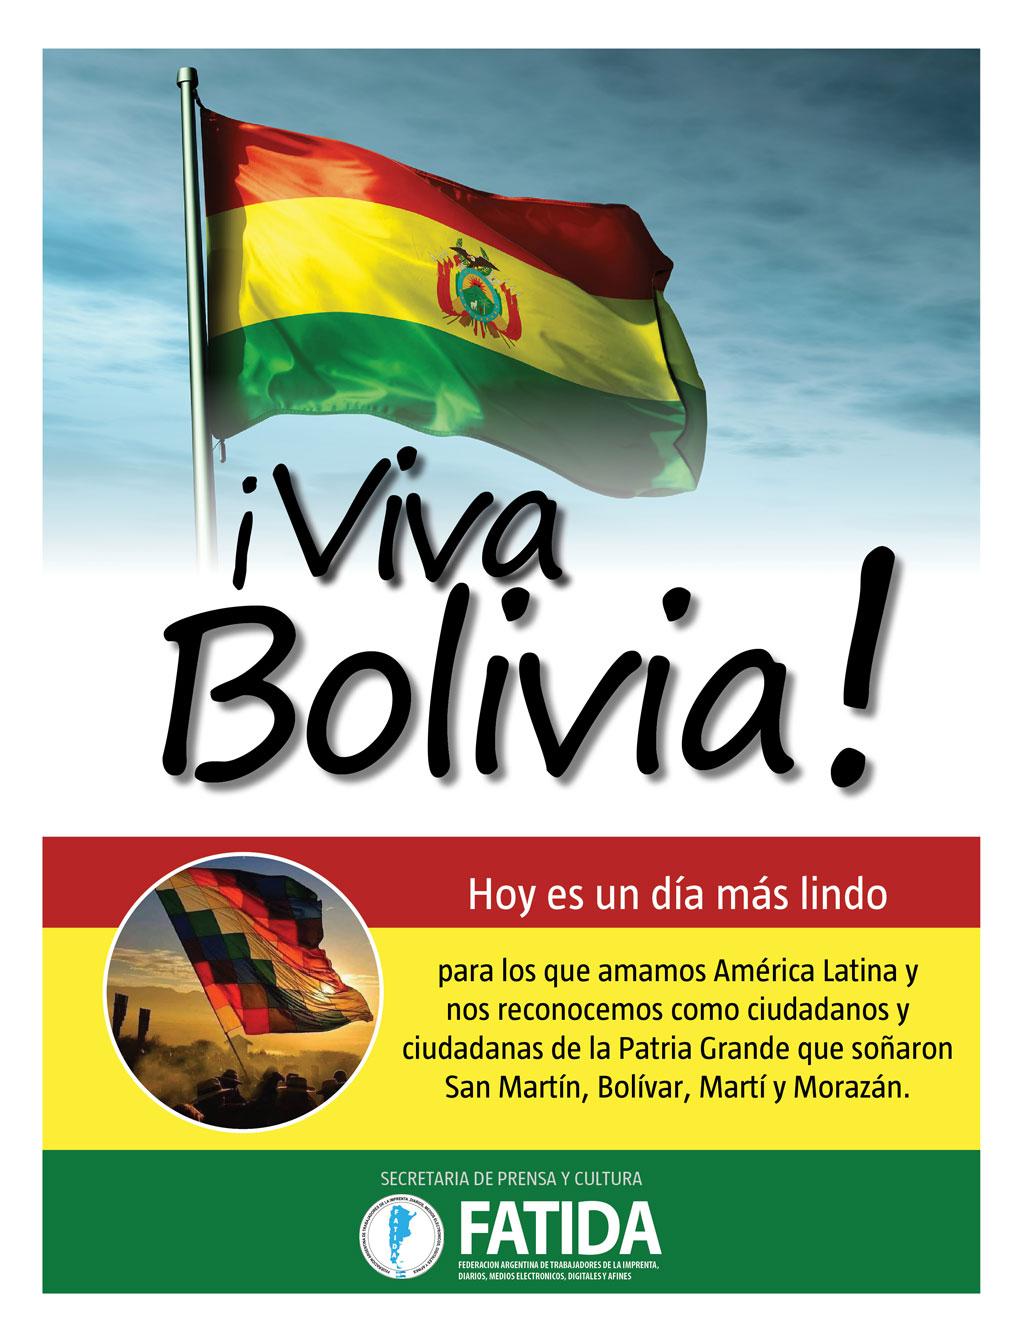 ¡Viva Bolivia!